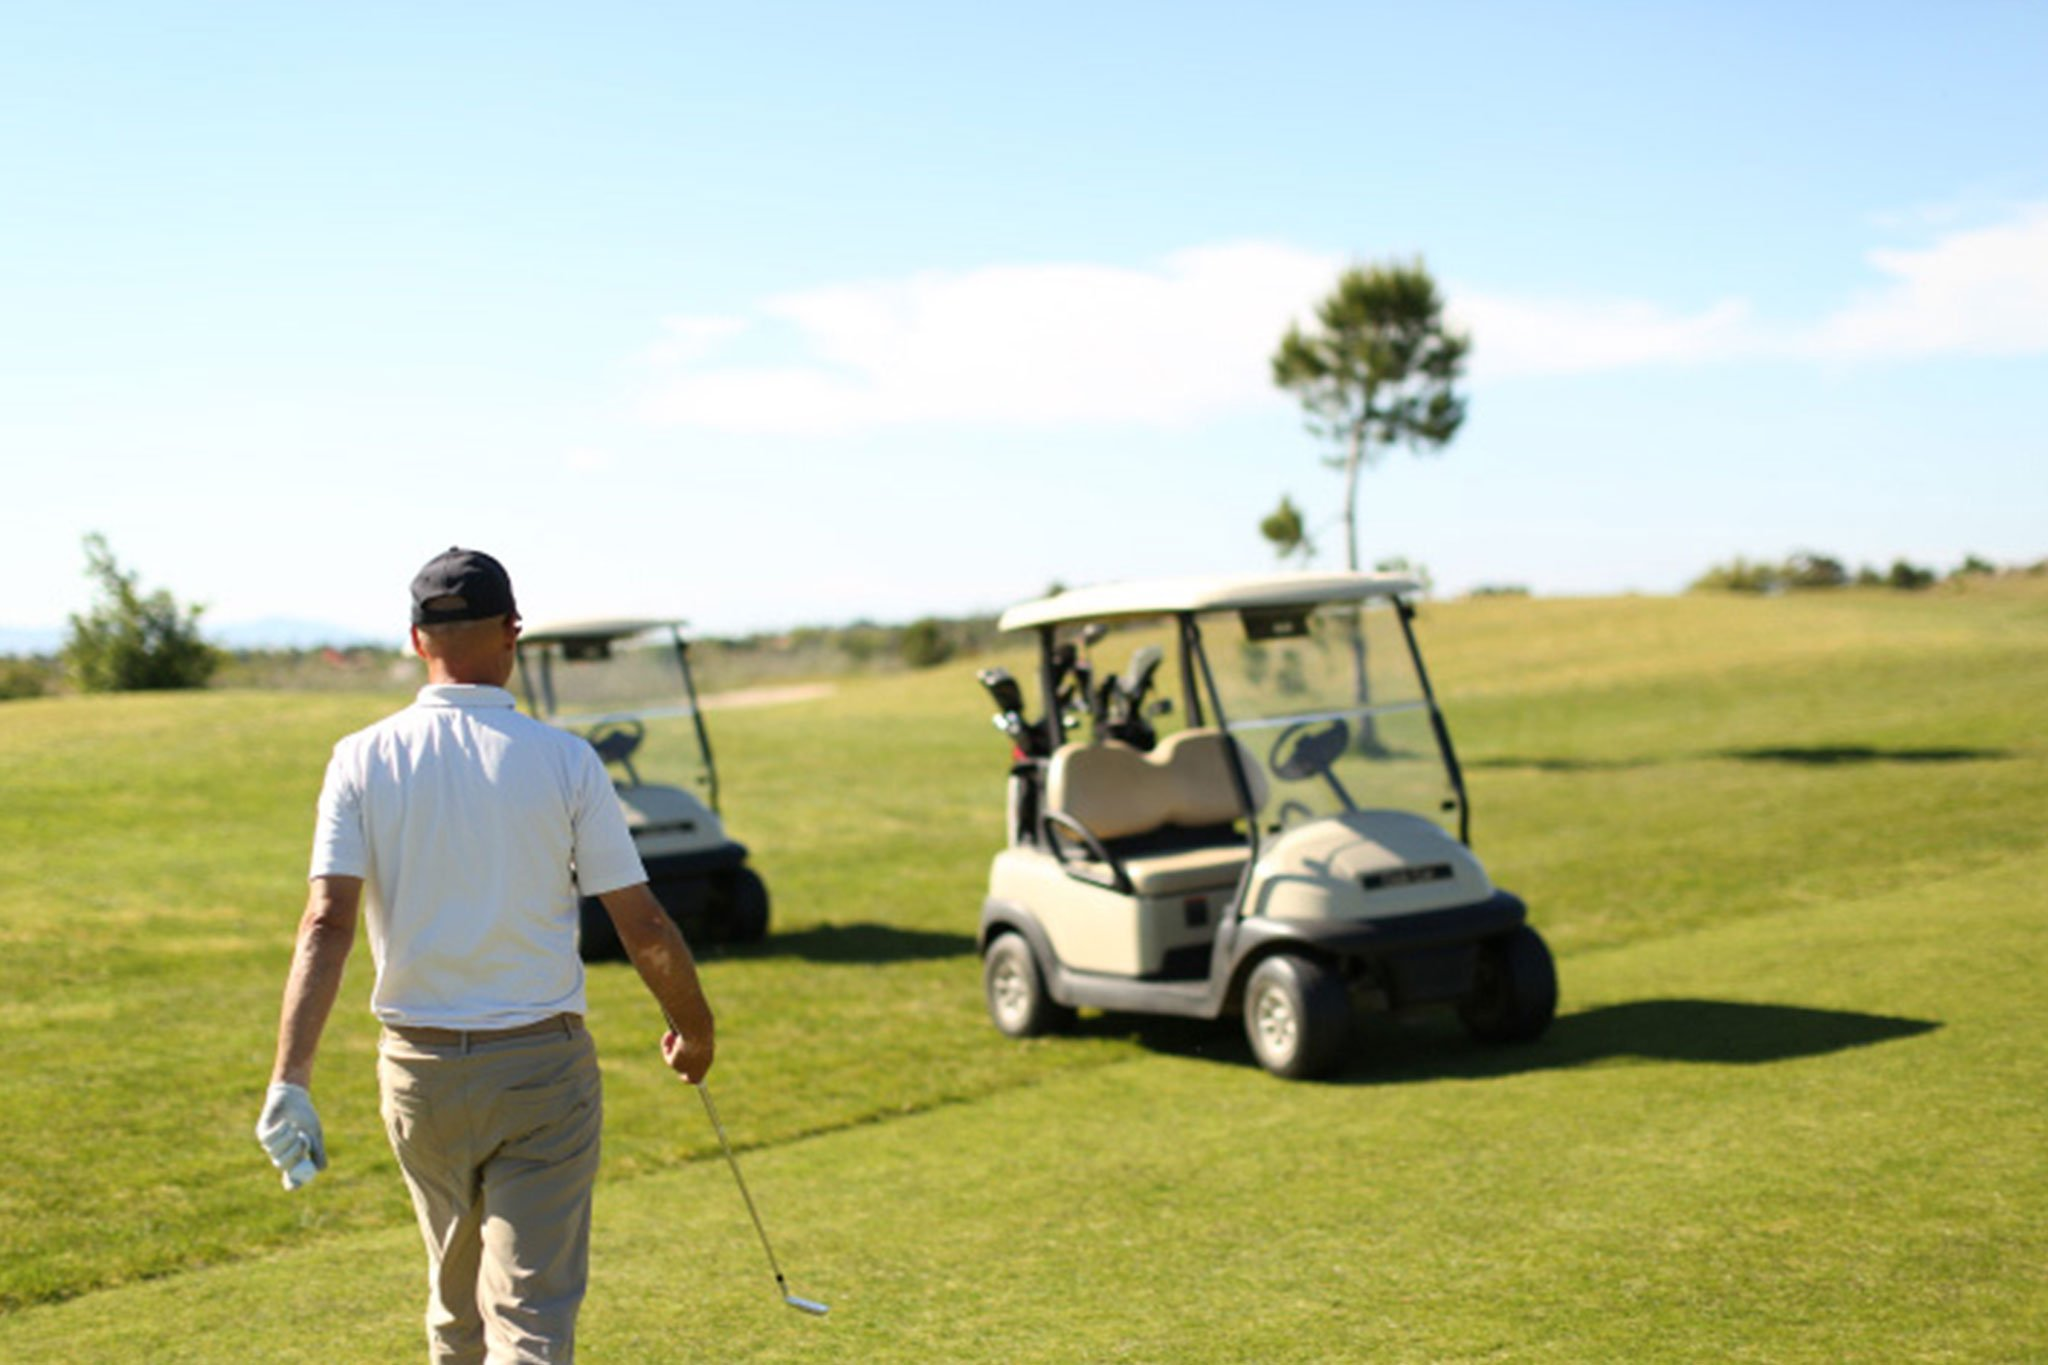 Golf in Dénia - La Sella Golf